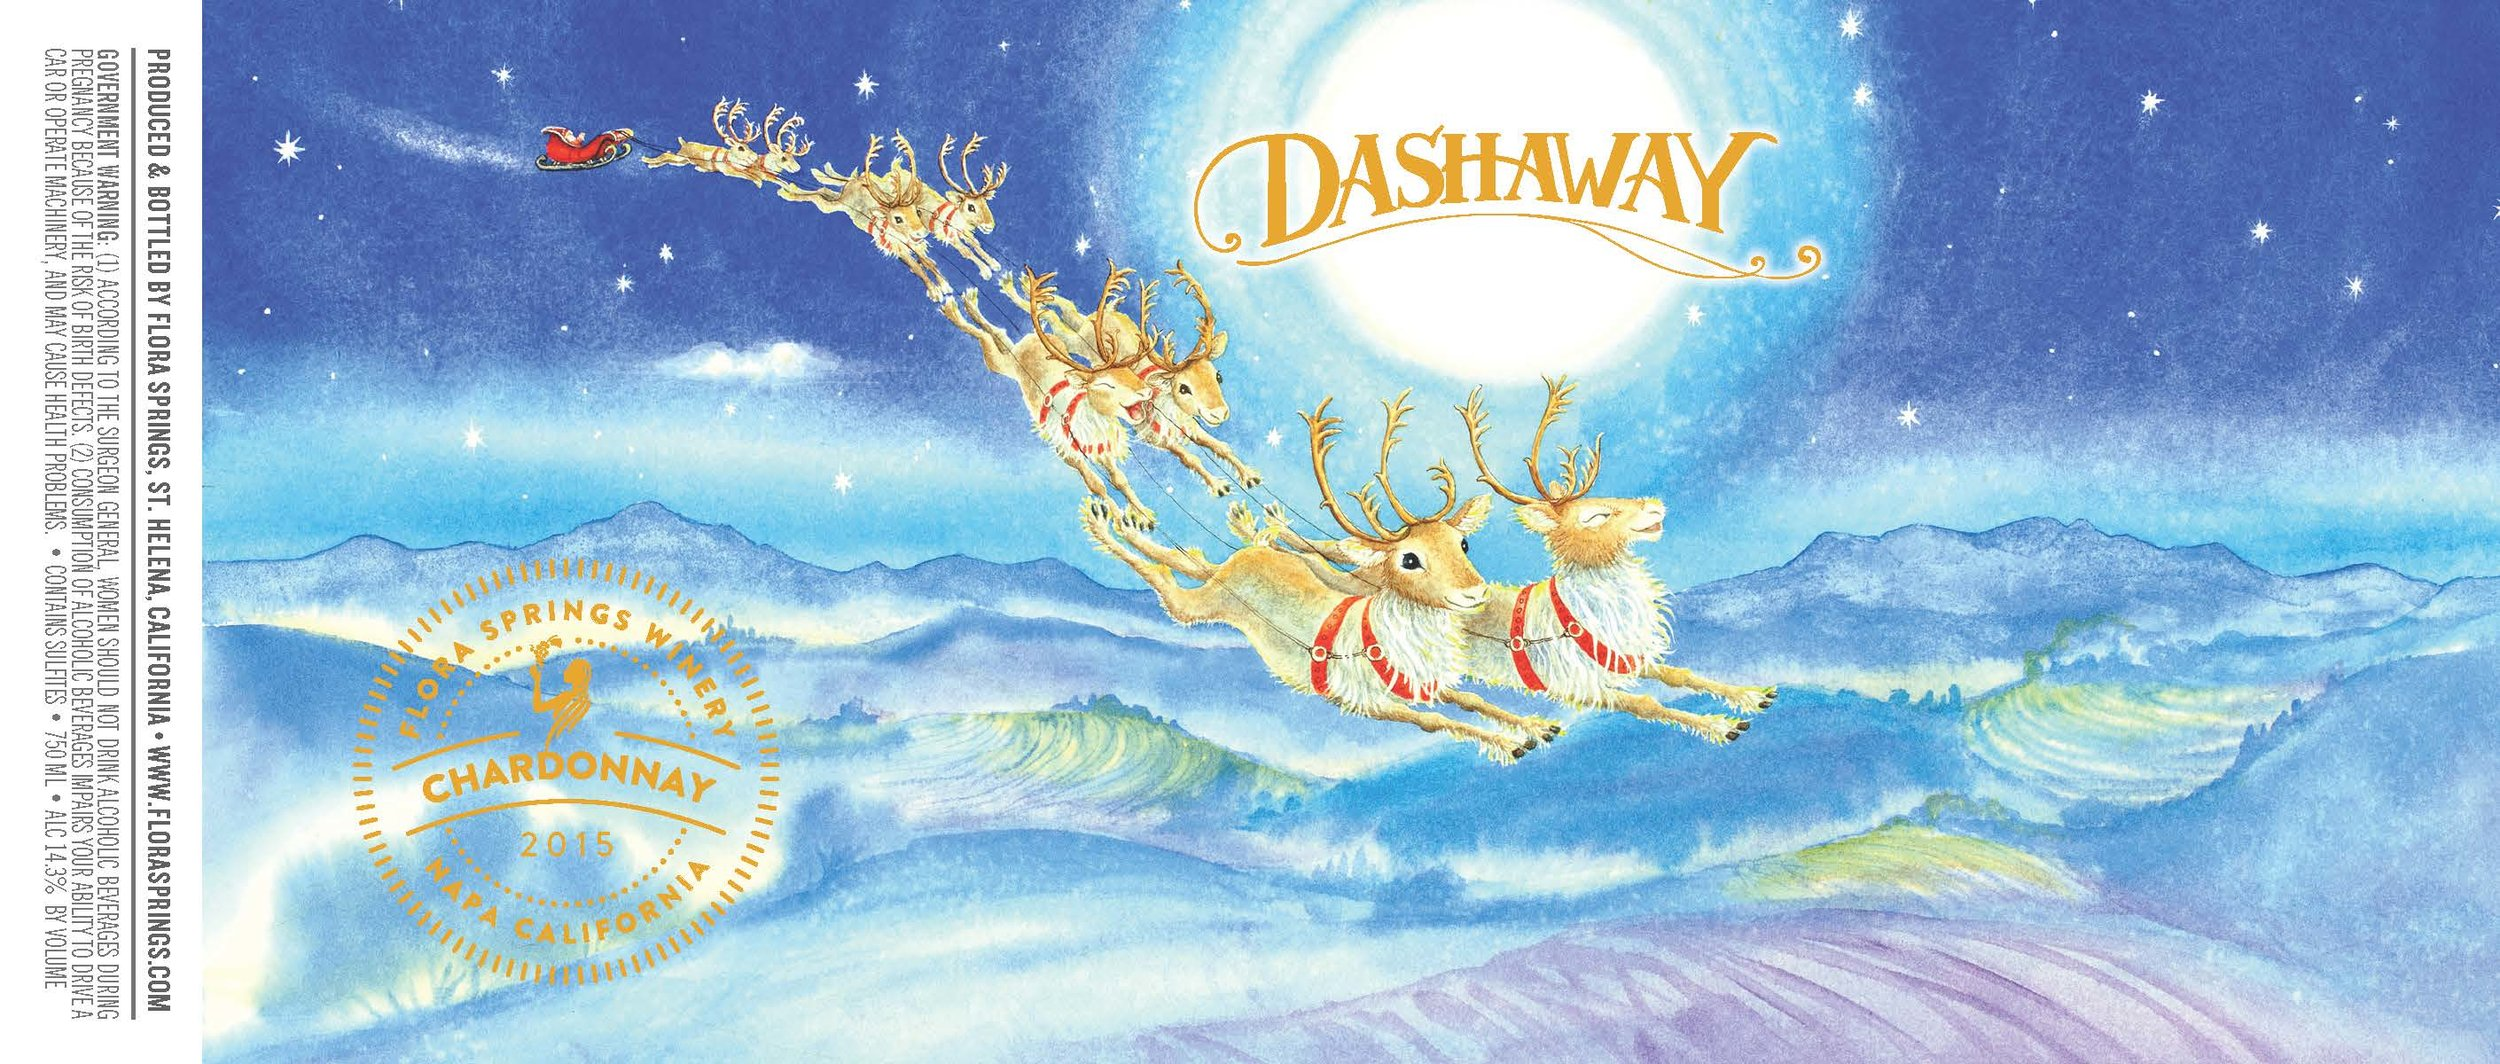 Dashaway Label_r6 (approved).jpg